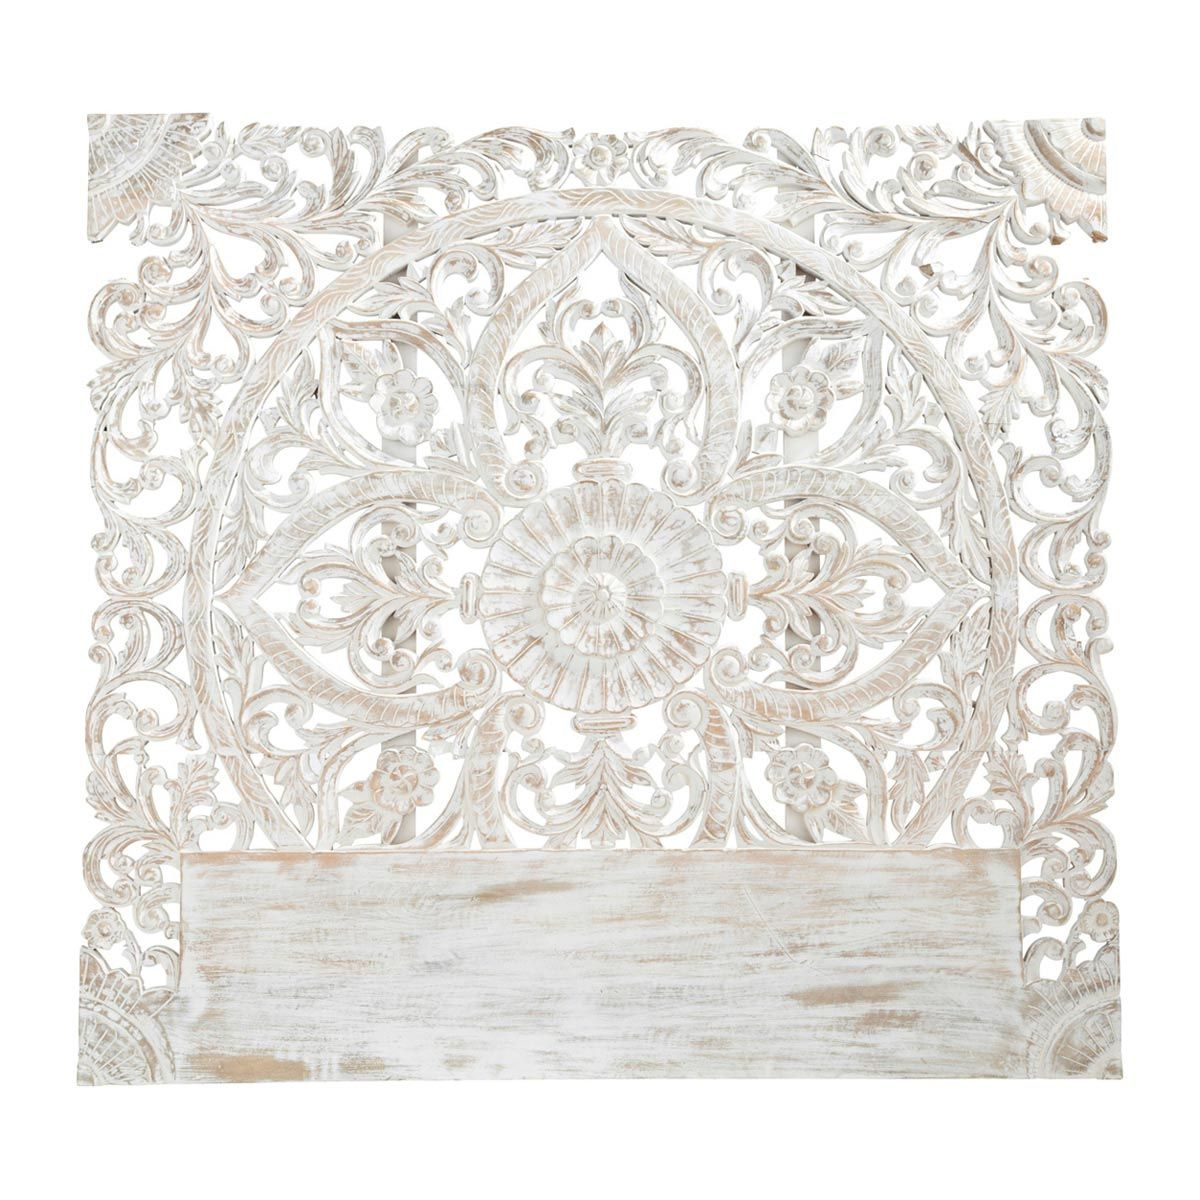 geschnitztes bett-kopfteil aus massivem mangoholz, b 160 cm, weiß, Schlafzimmer entwurf